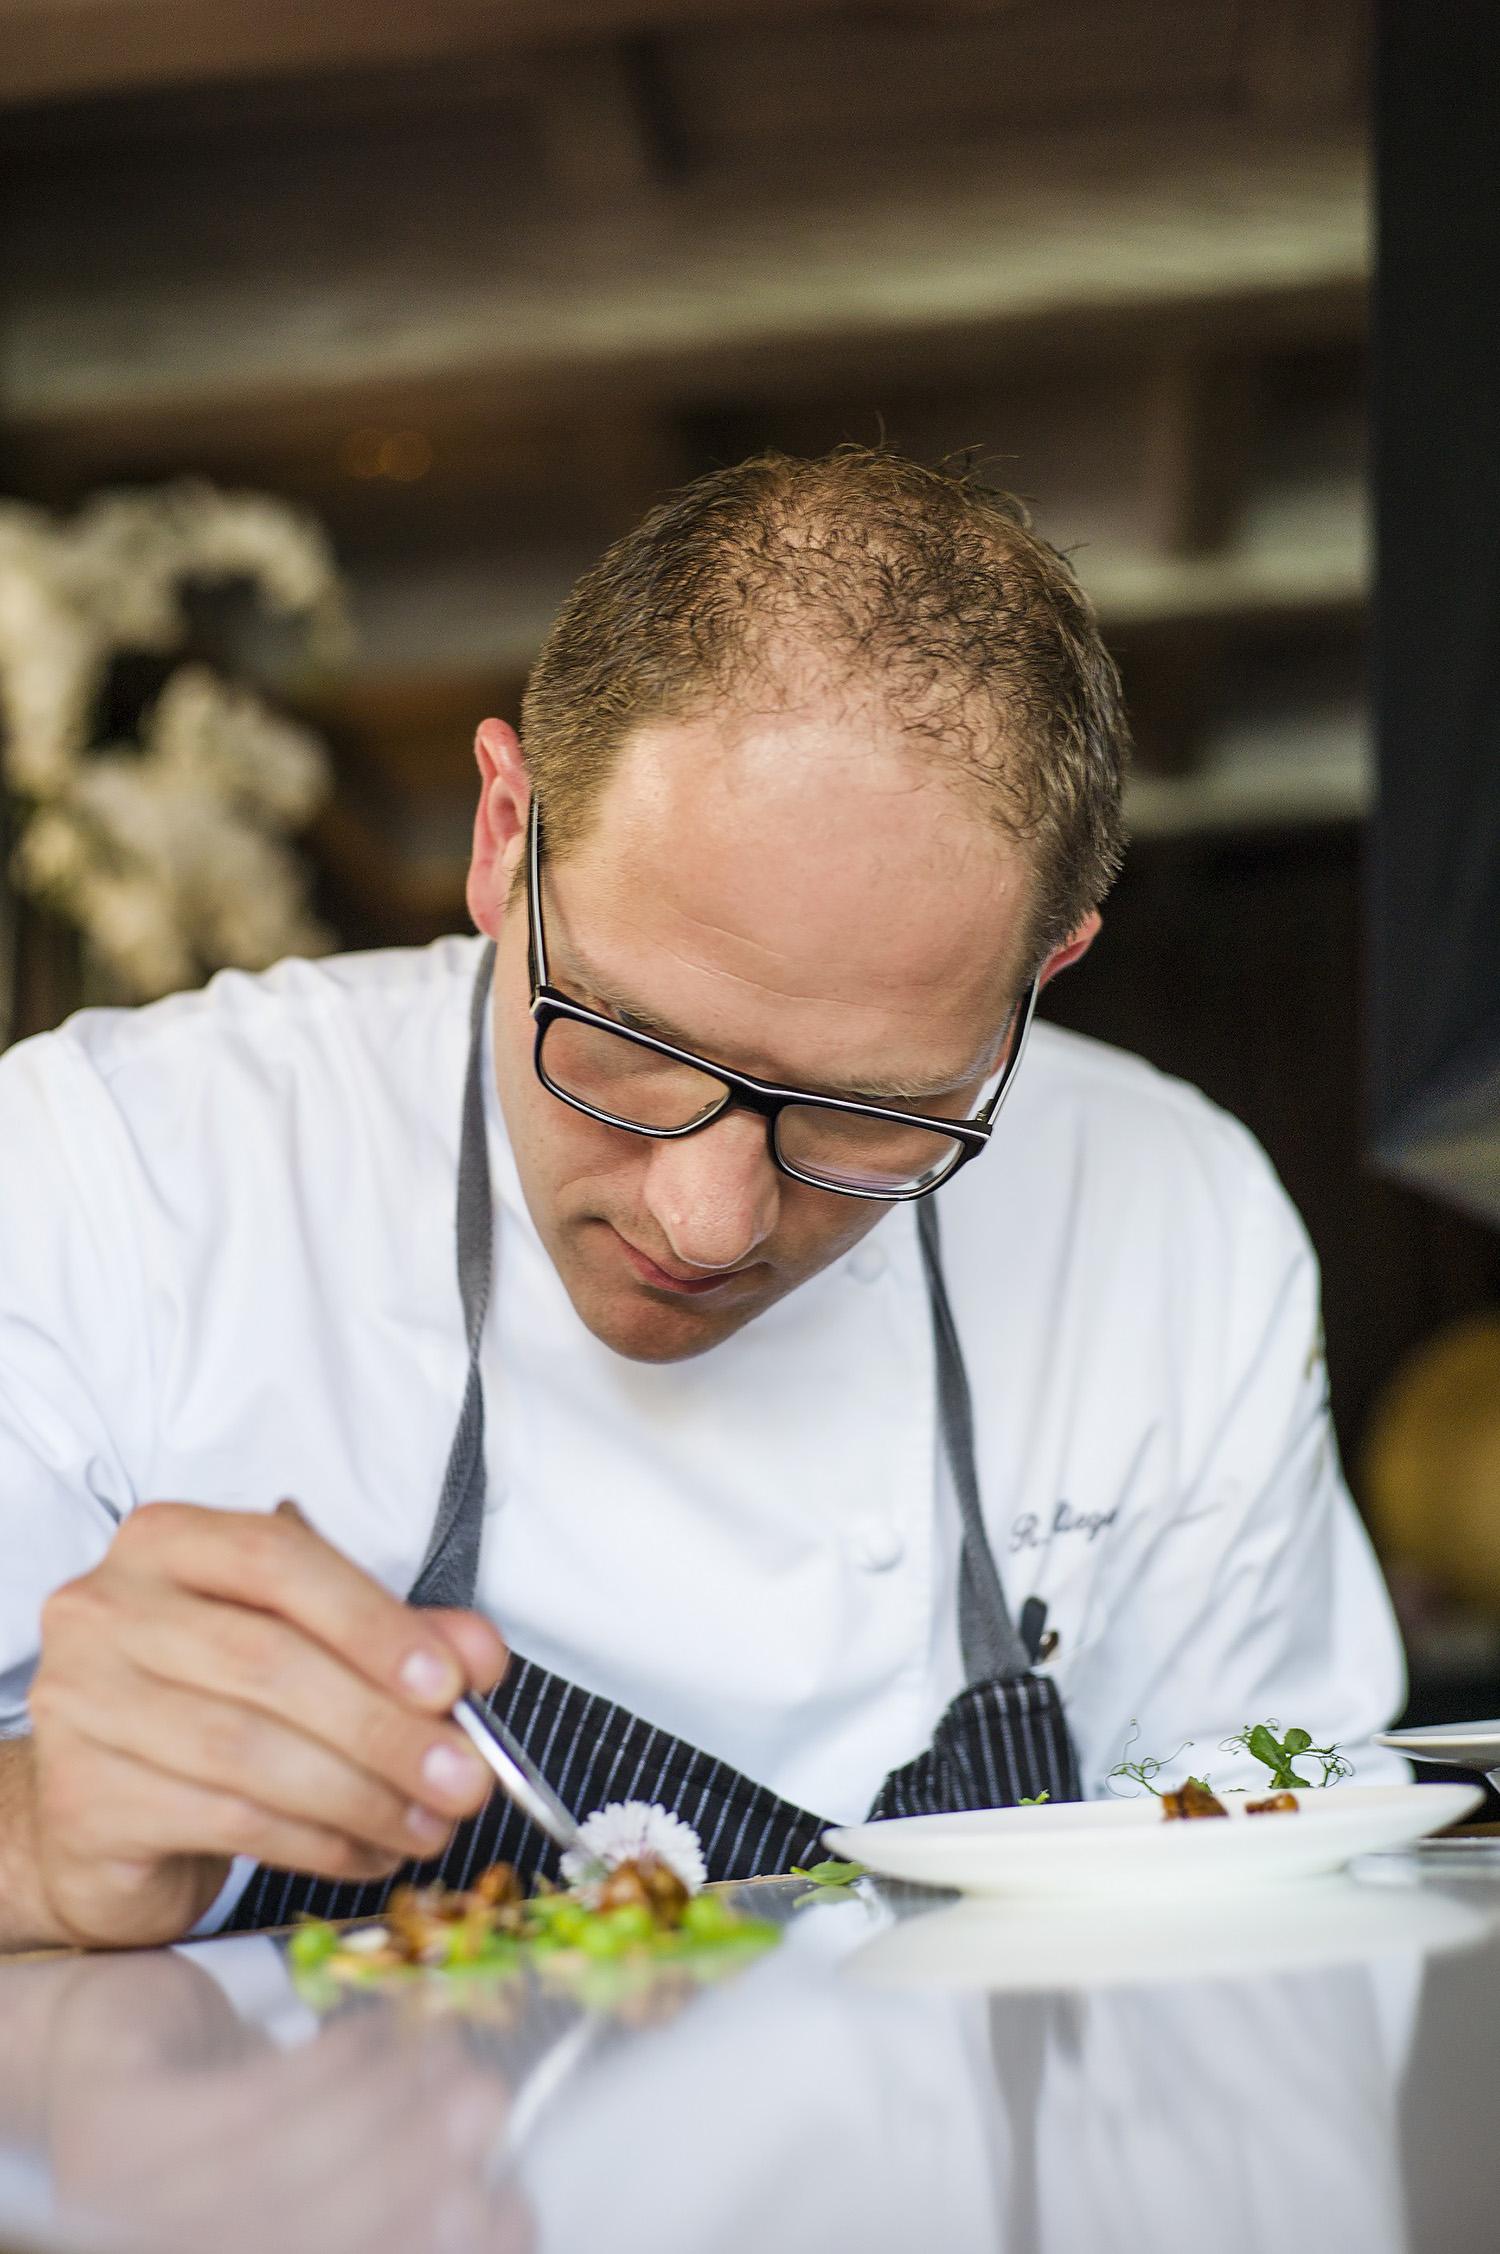 Chef Rolf Fliegauf Angsana 3